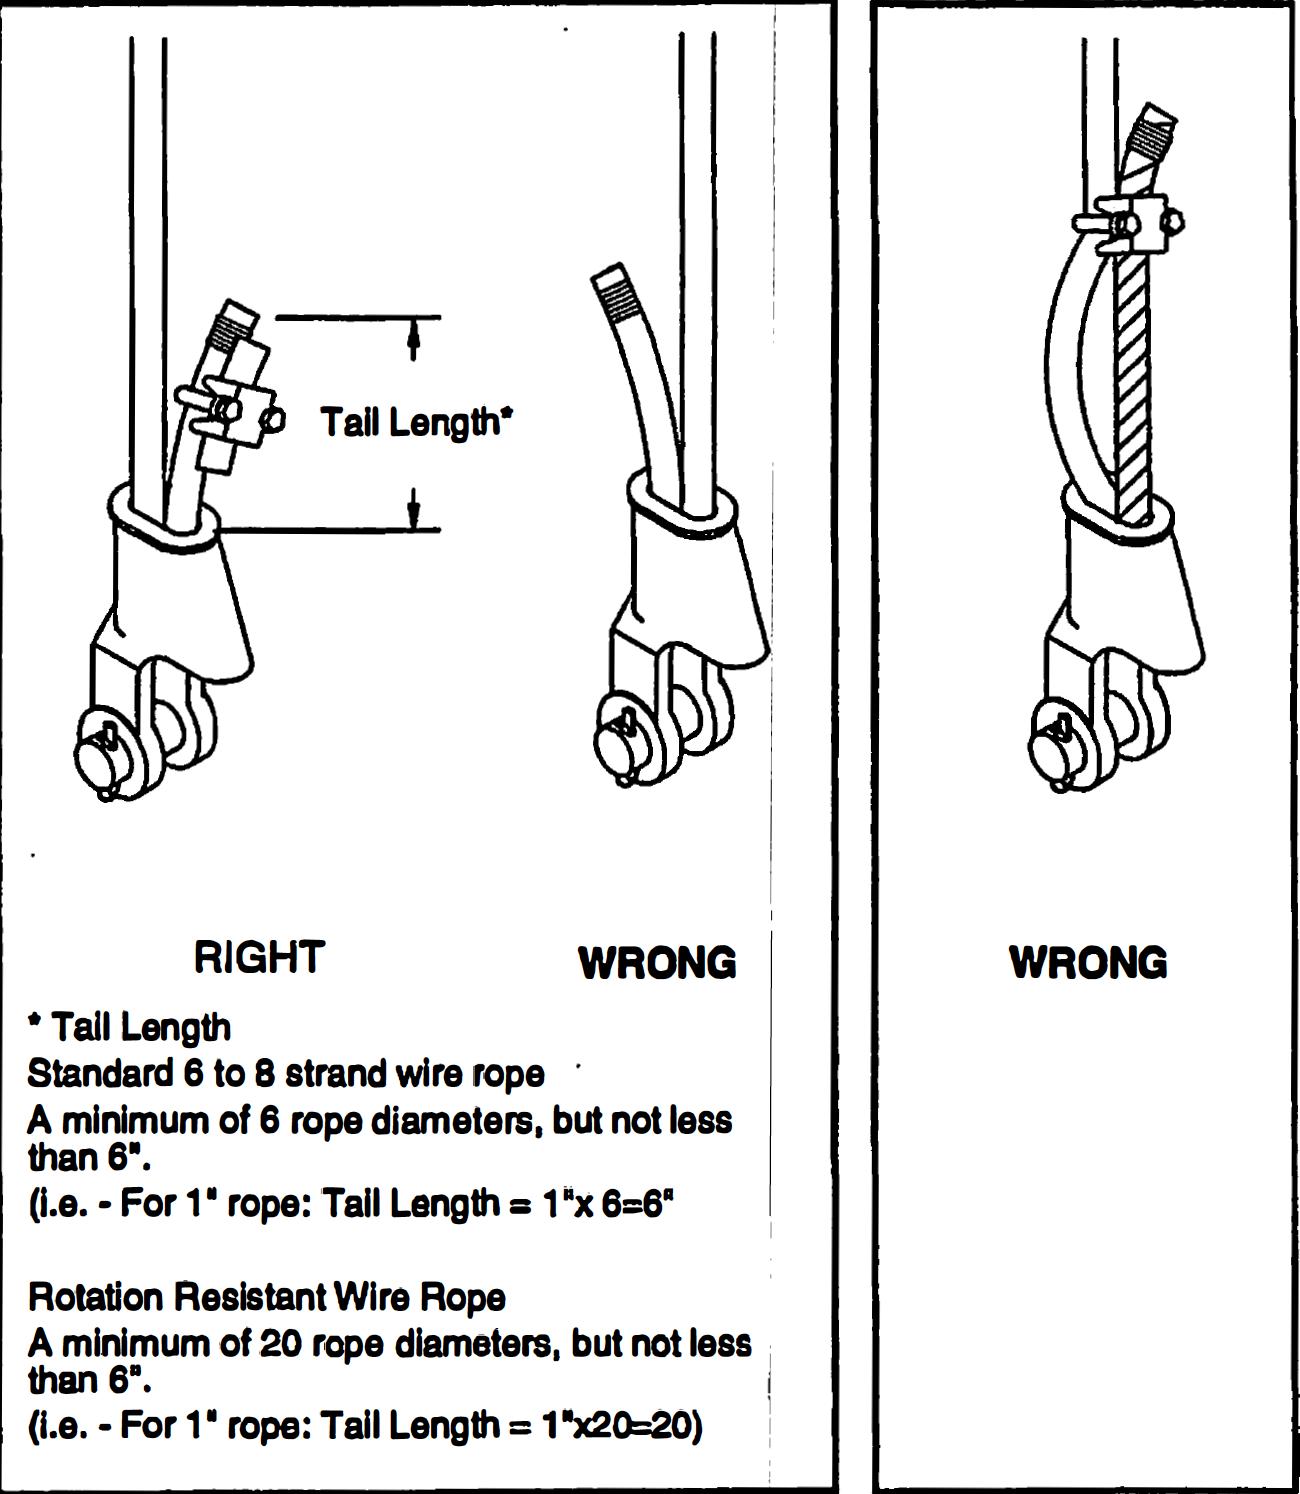 hesco-crane-inspection-standard-wedge-socket.png